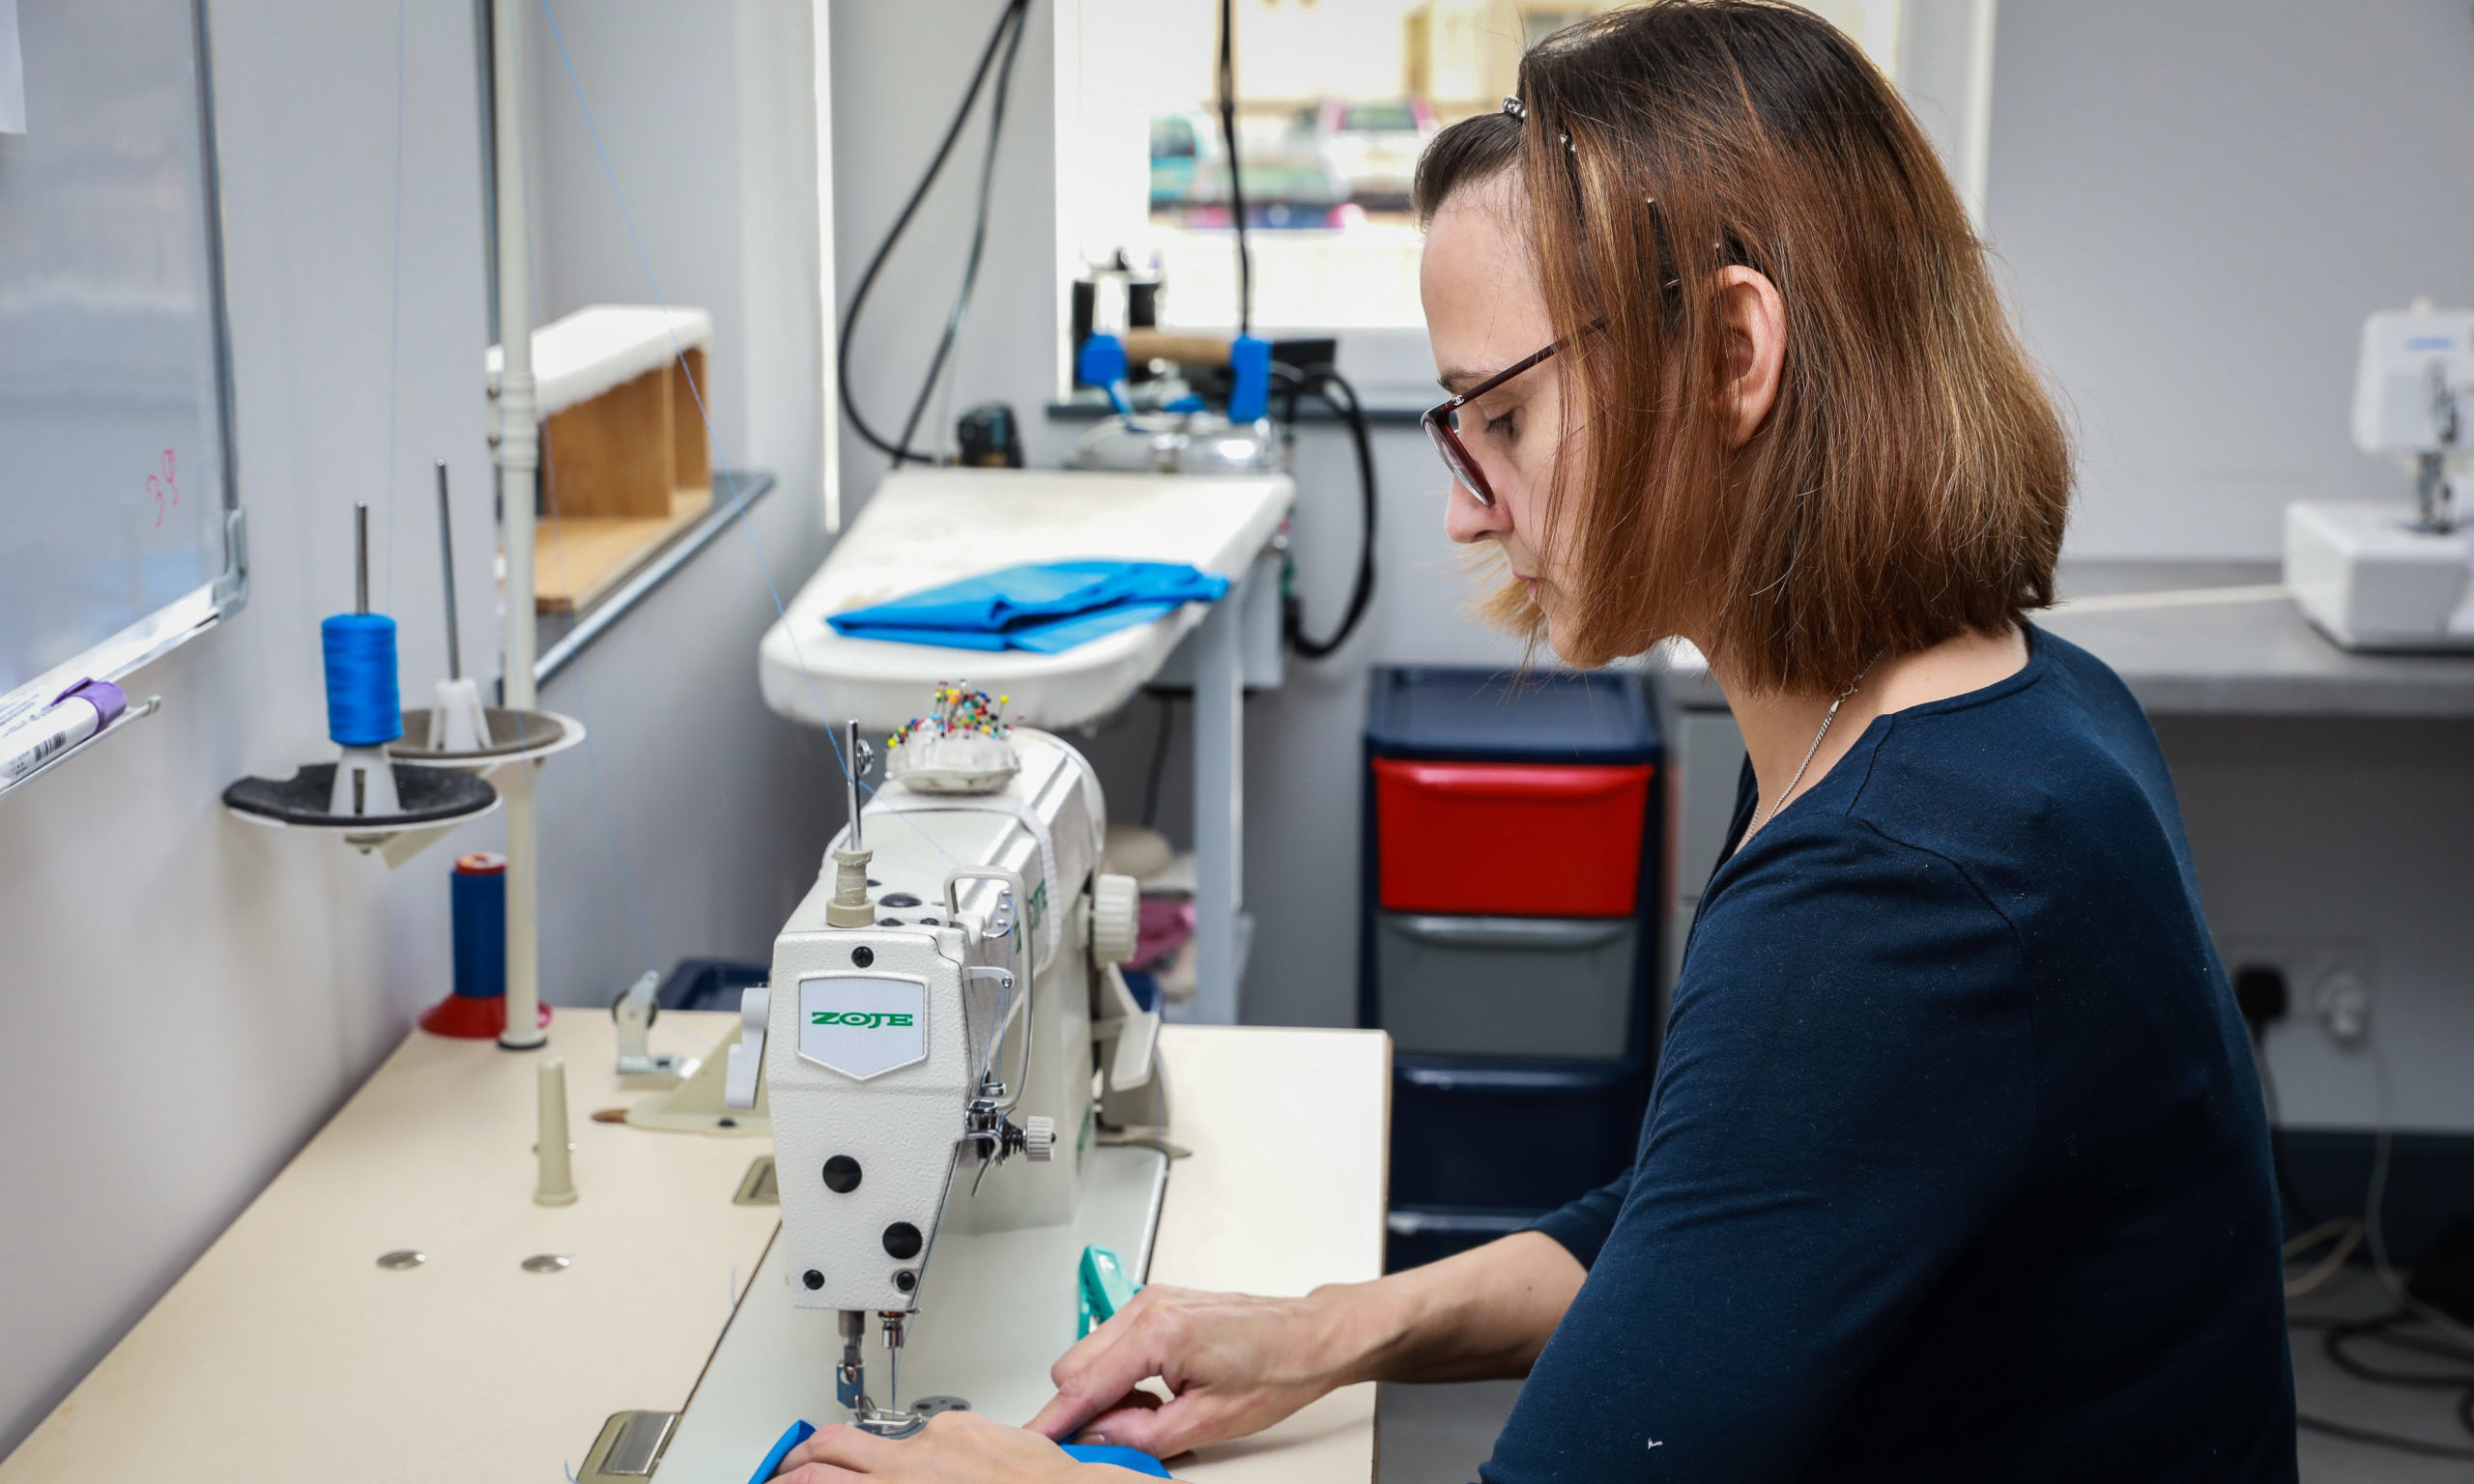 Mirka at work in her shop.